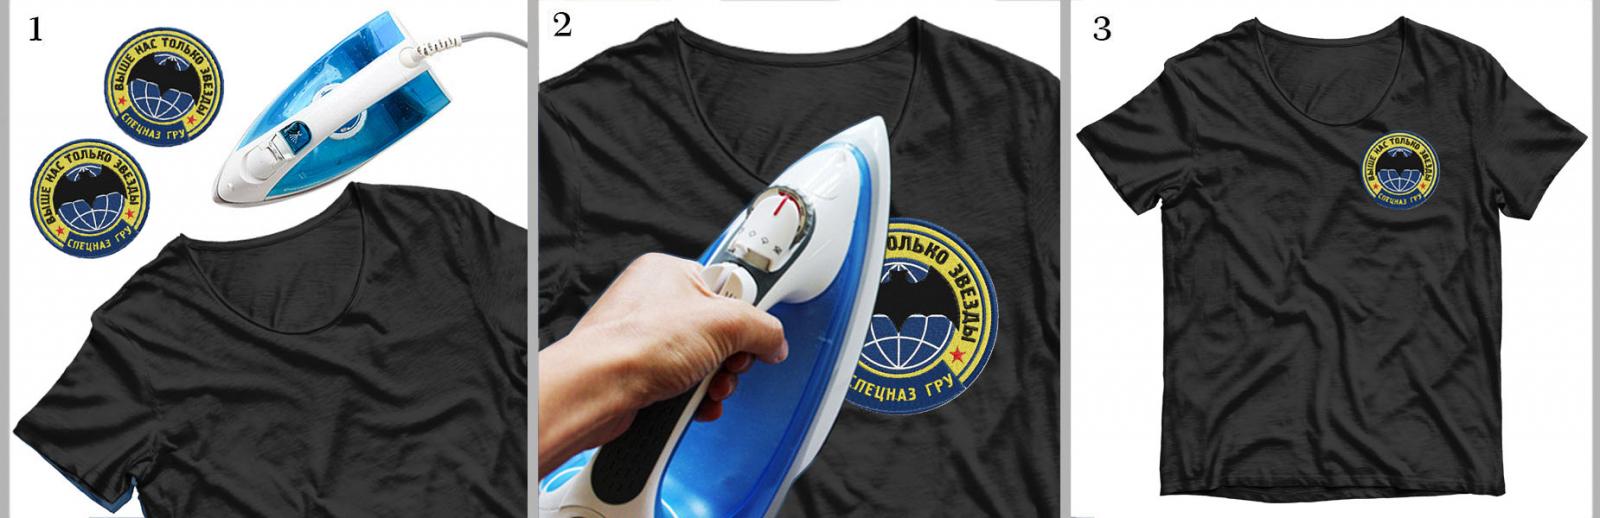 "Шеврон разведки ""Девиз Спецназа ГРУ"" на футболке"